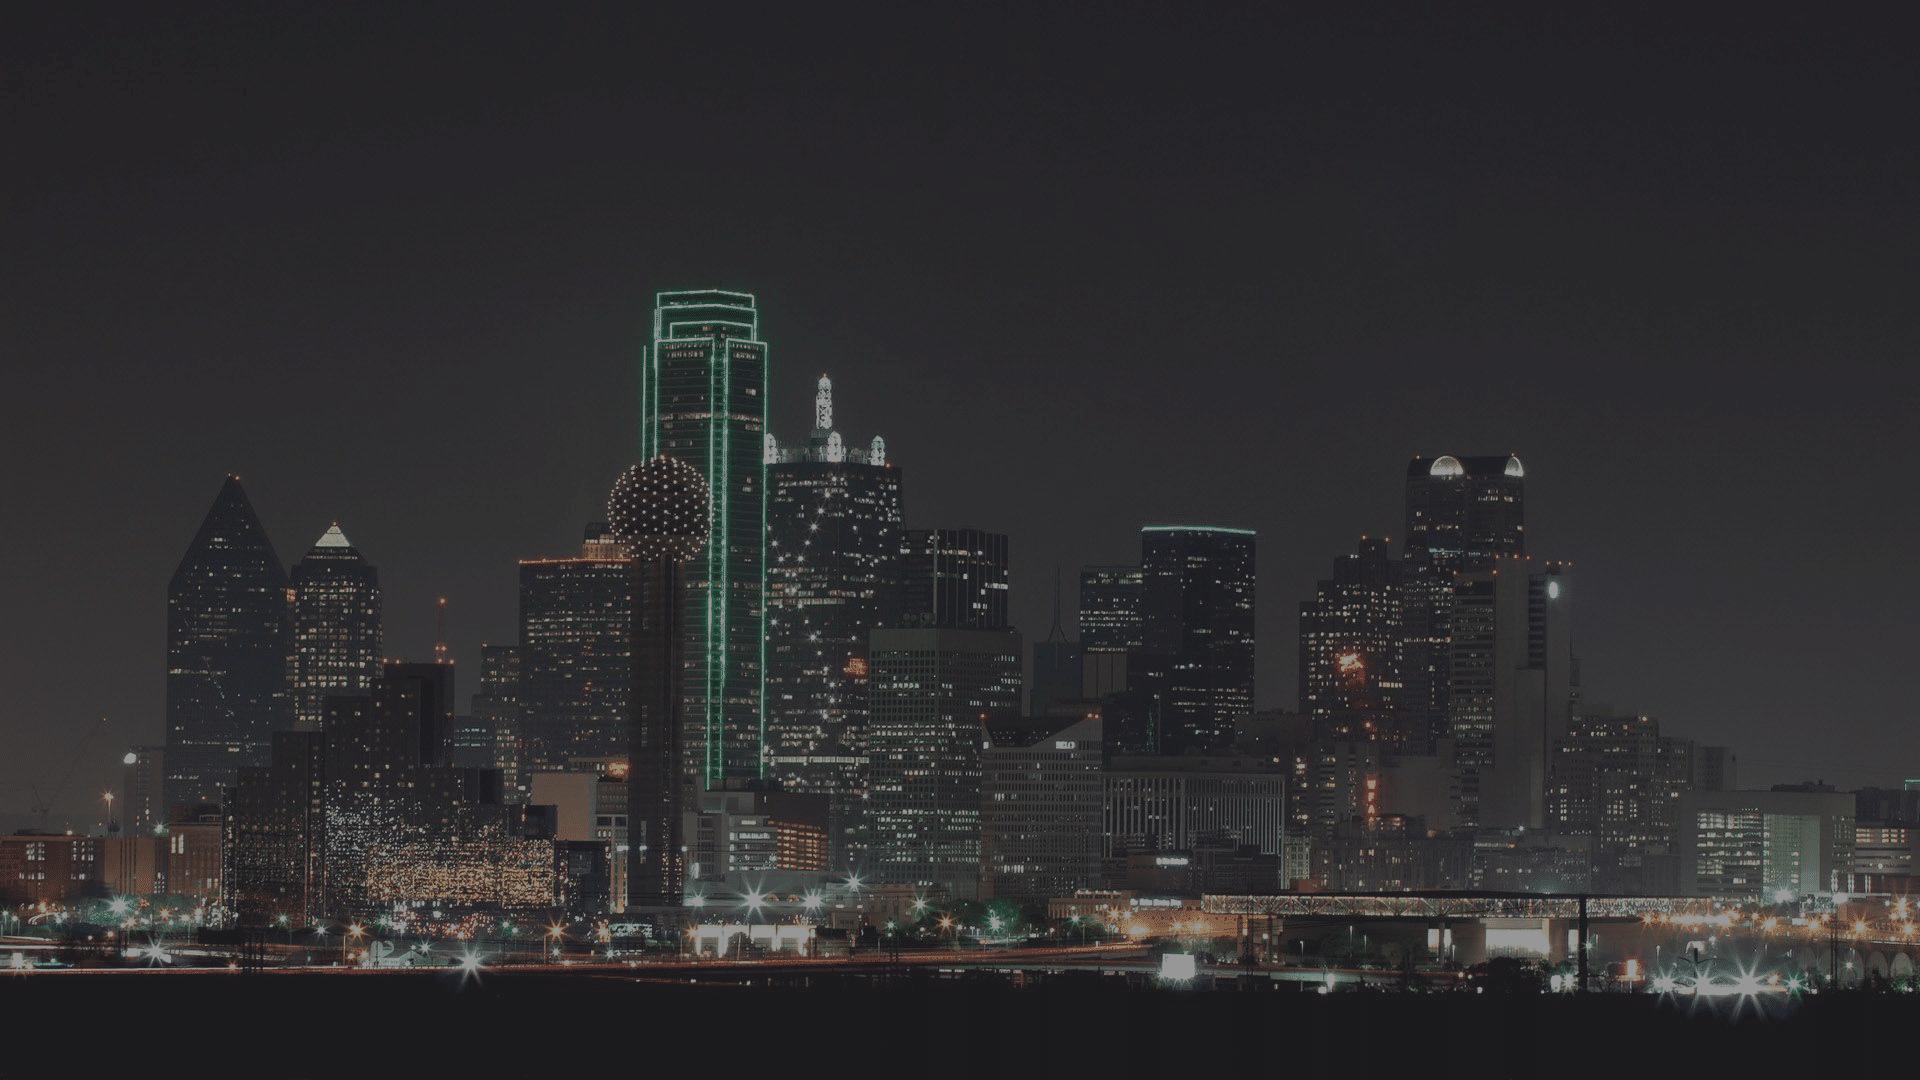 Dallas skyline with overlay